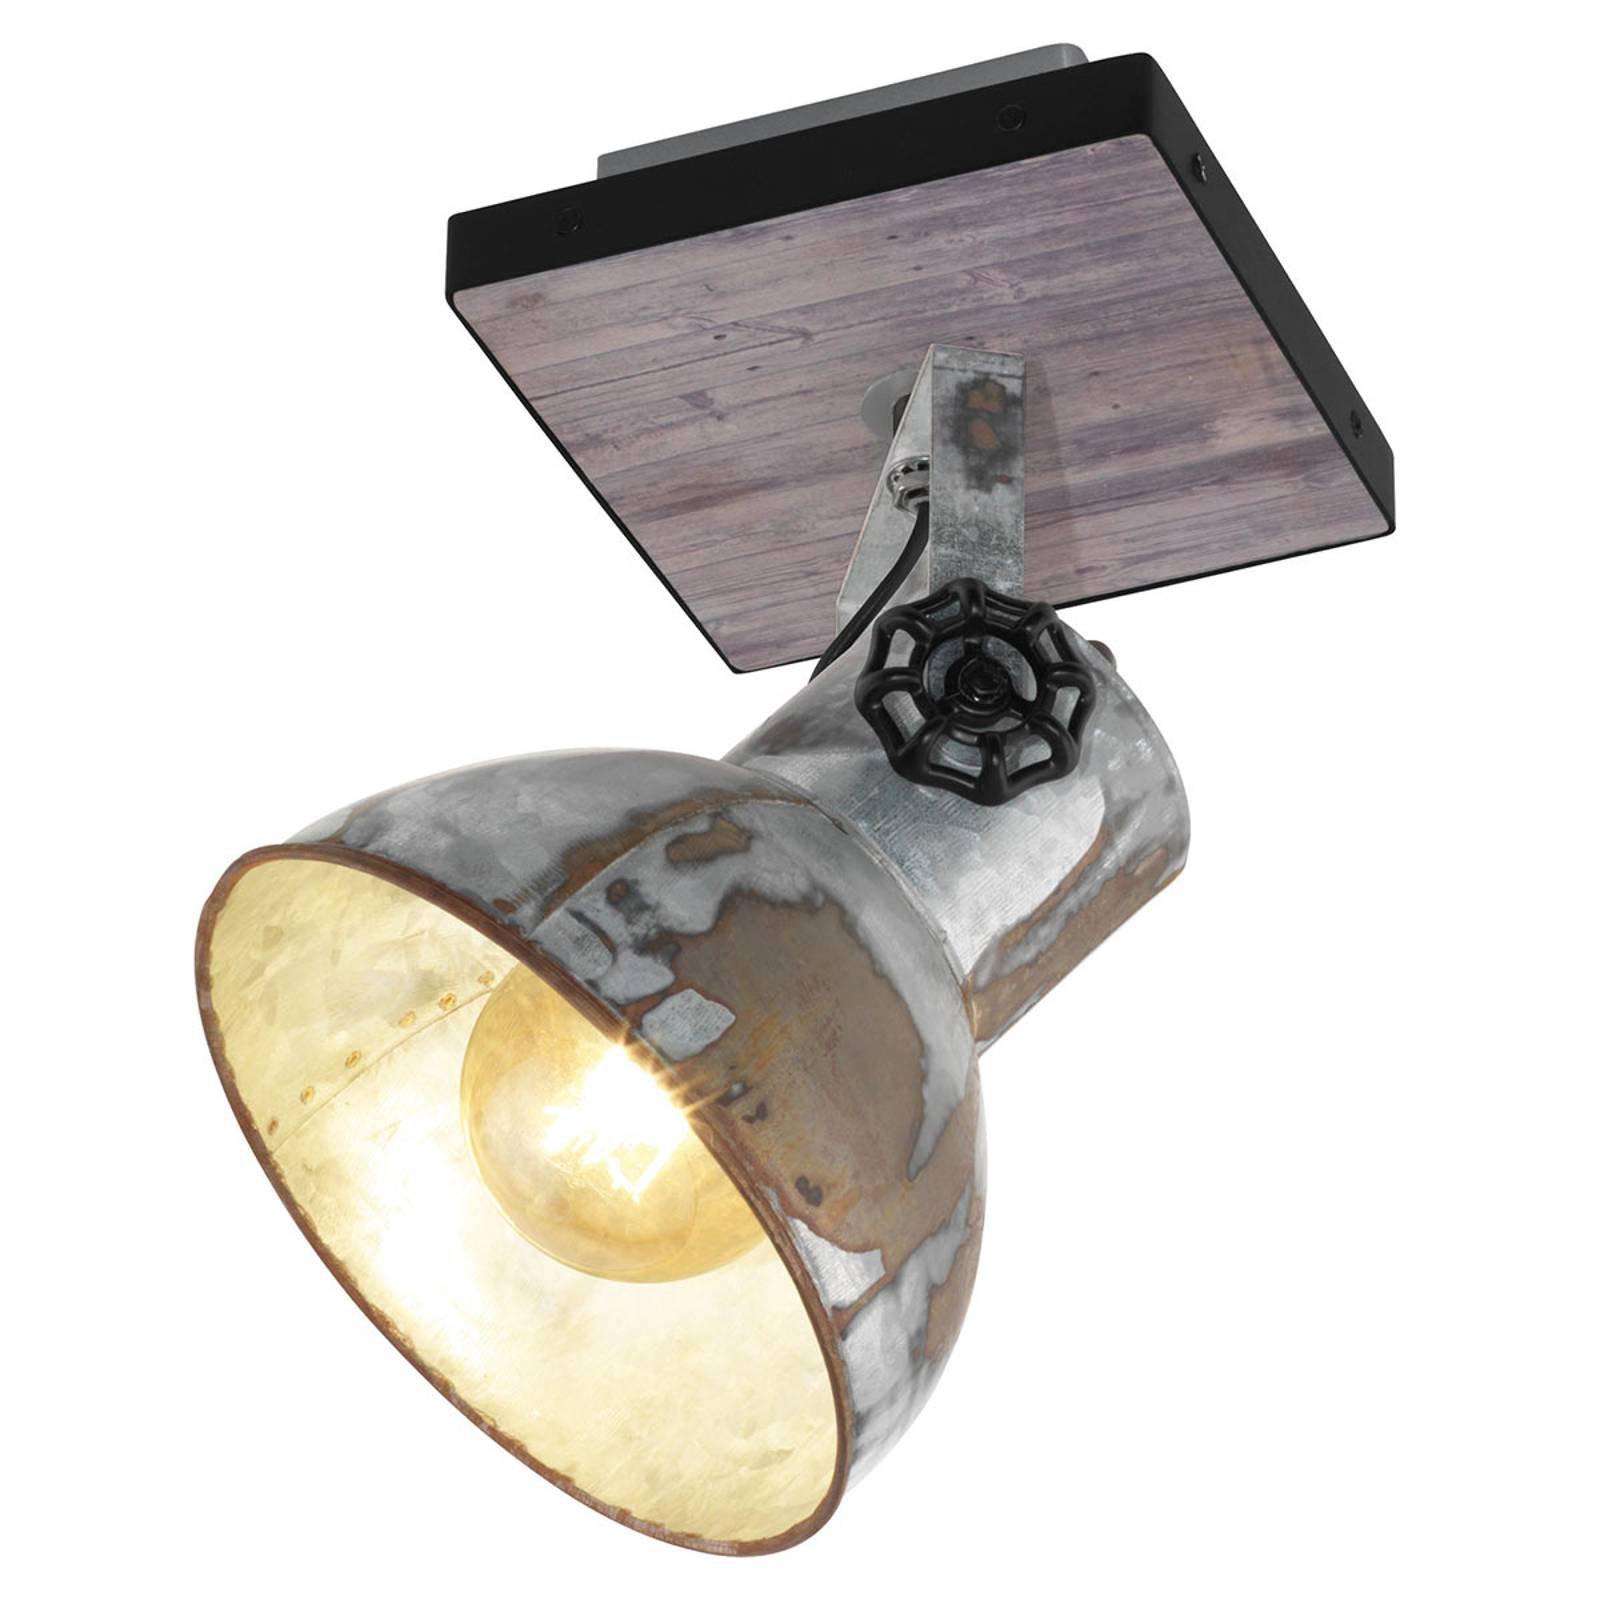 Taklampe Barnstaple i industriell stil, 1 lyskilde